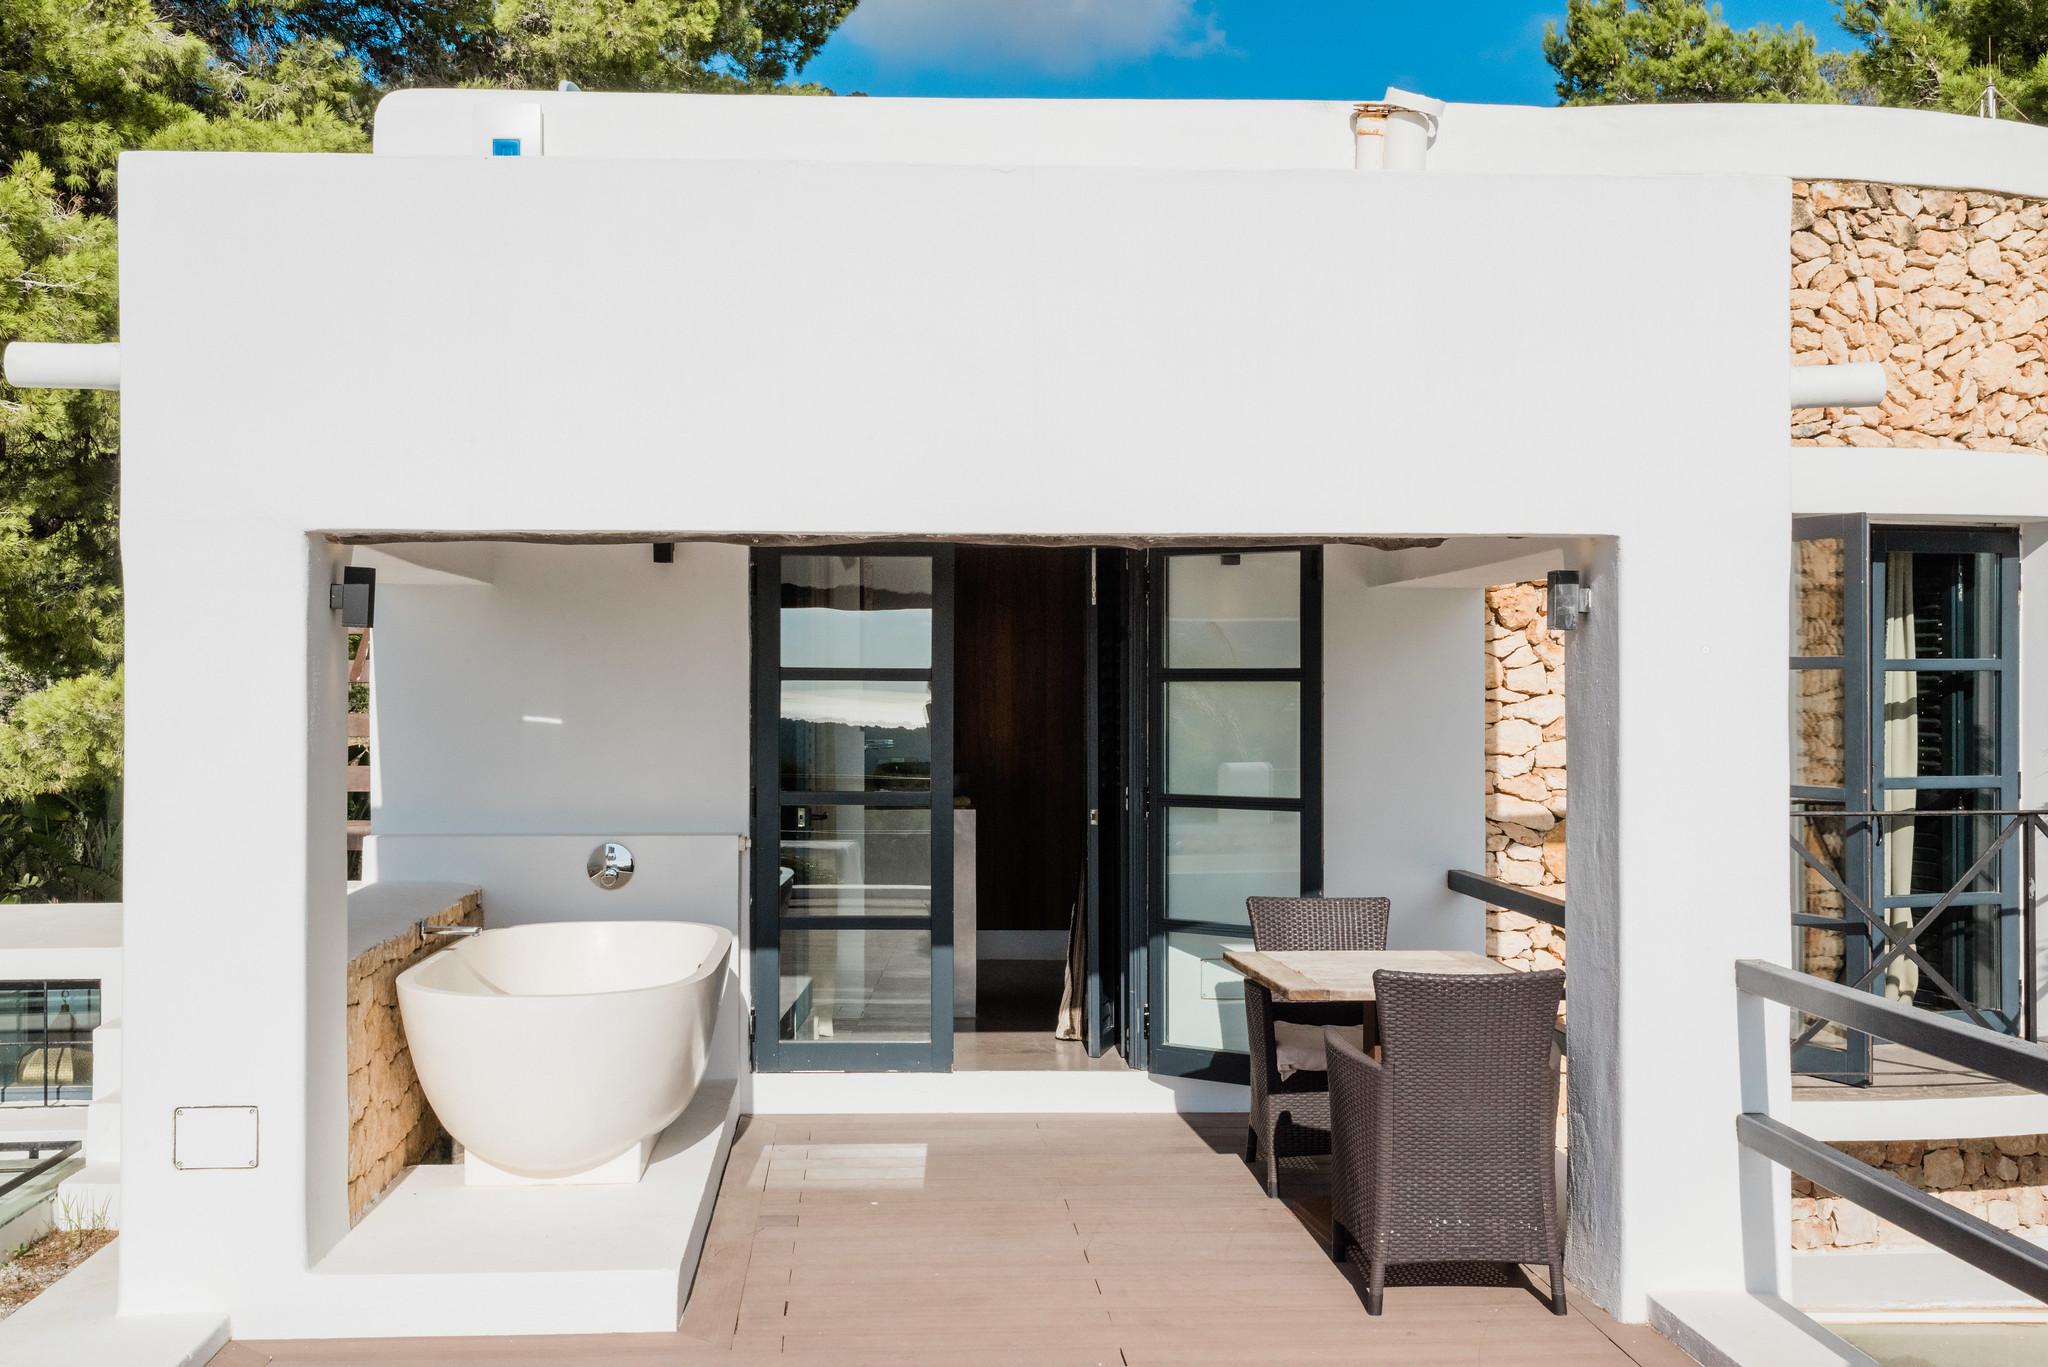 https://www.white-ibiza.com/wp-content/uploads/2020/05/white-ibiza-villas-casa-amalia-exterior-master-terrace.jpg